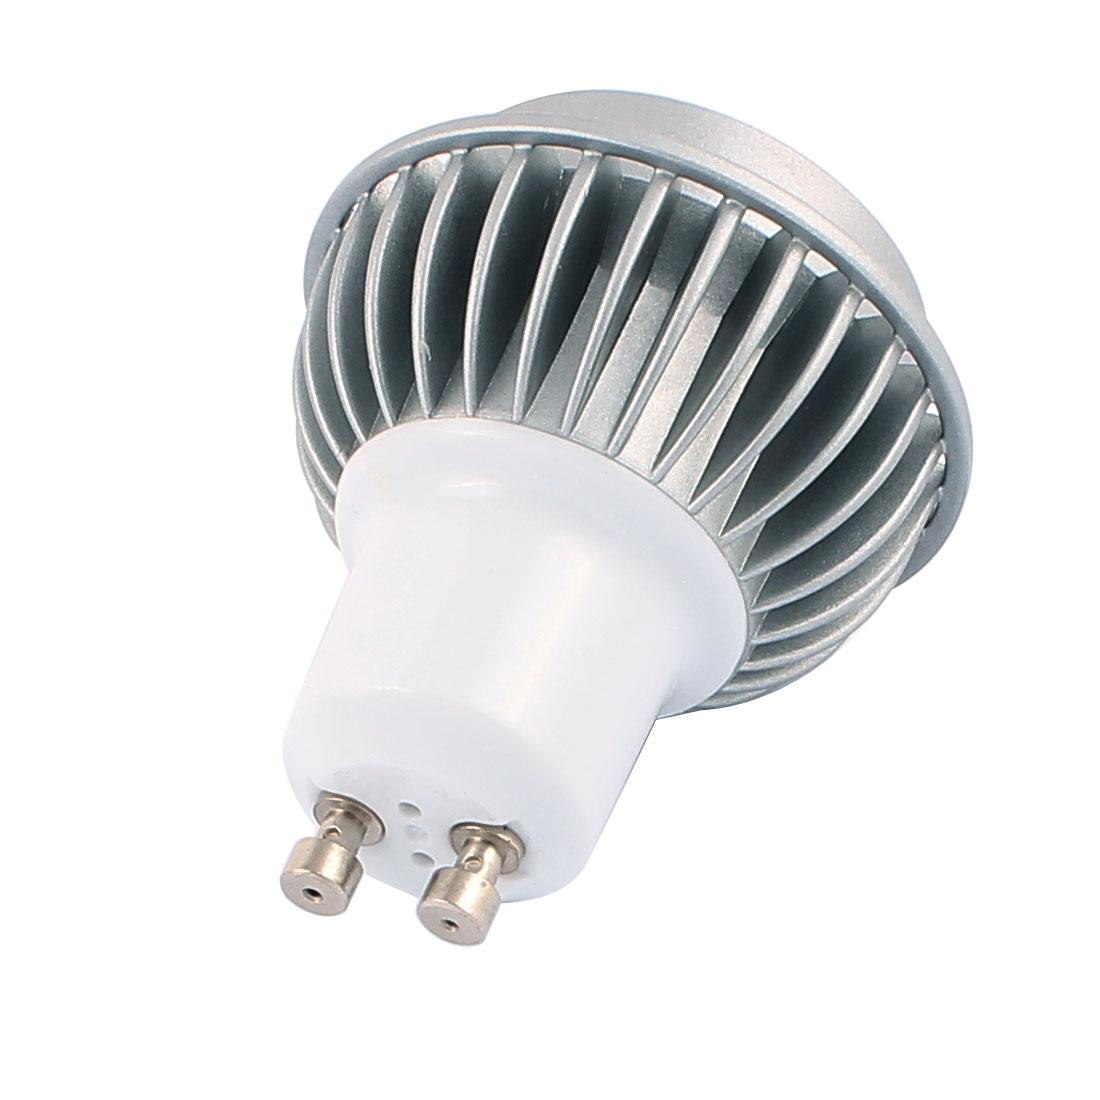 AC85-265V-3W-GU10-Base-COB-LED-Spotlight-Bulb-Downlight-Energy-Saving-Pure-White